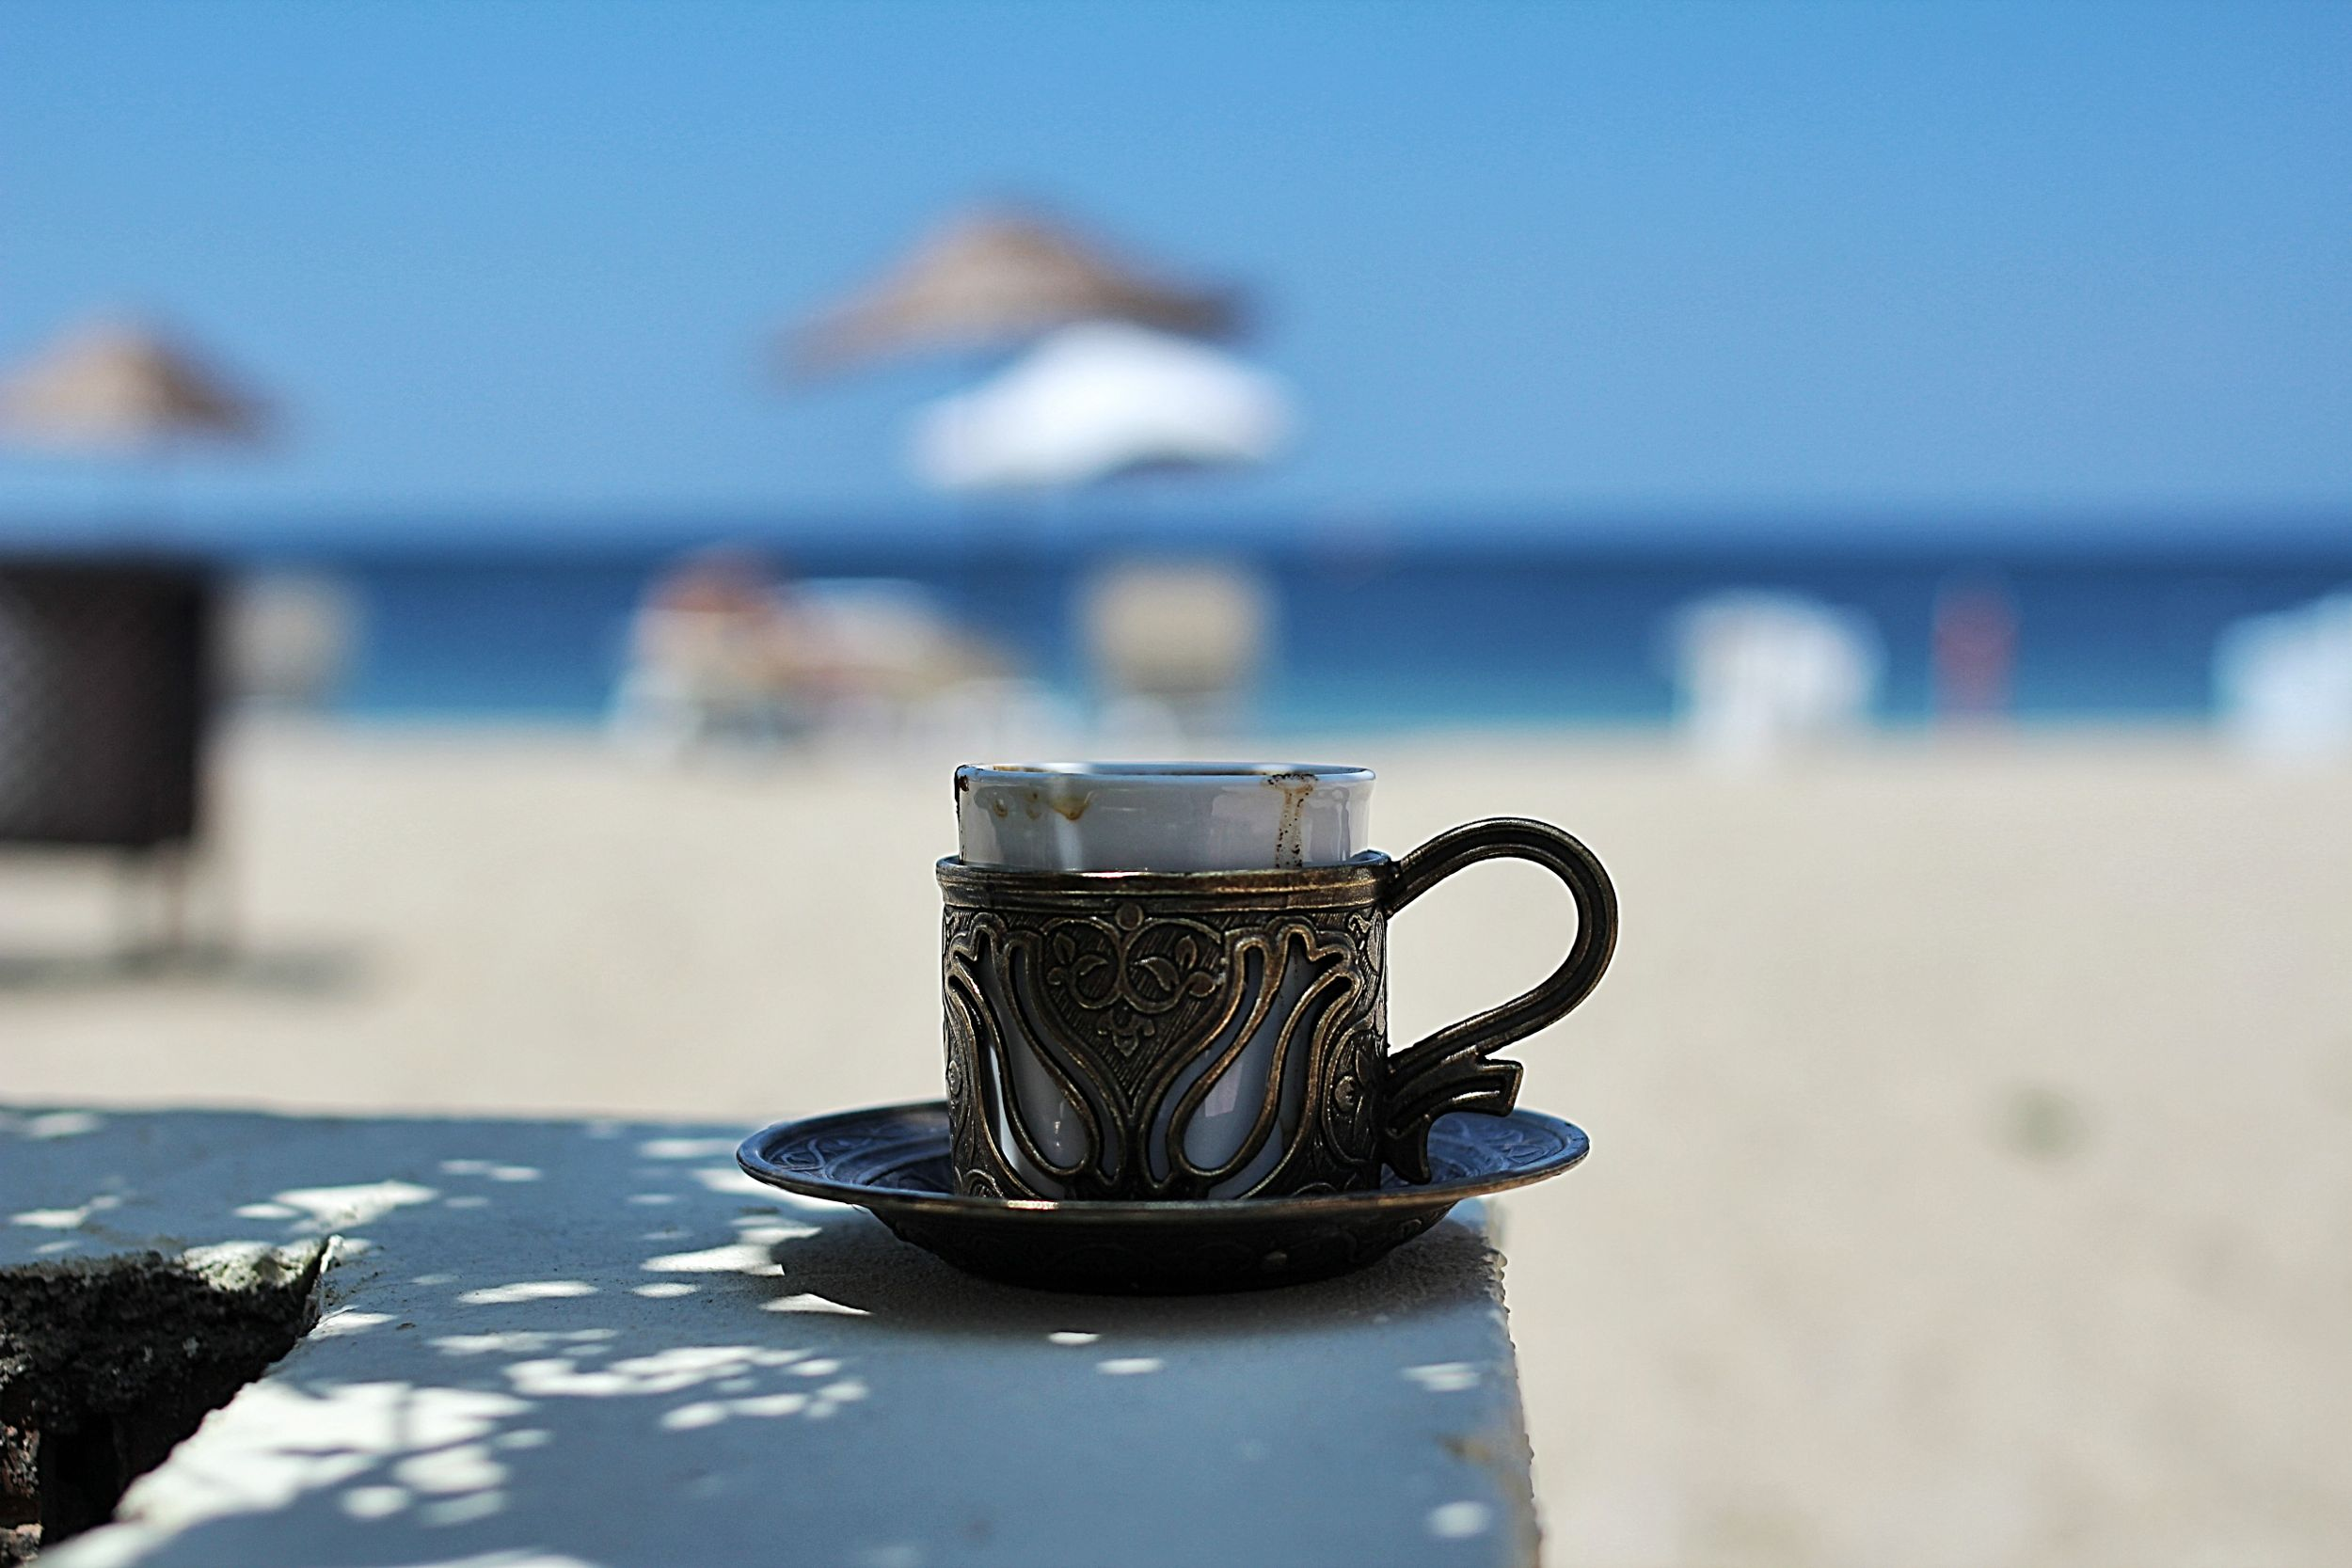 avşa, gununkahvesi, türk kahvesi, turkish coffee